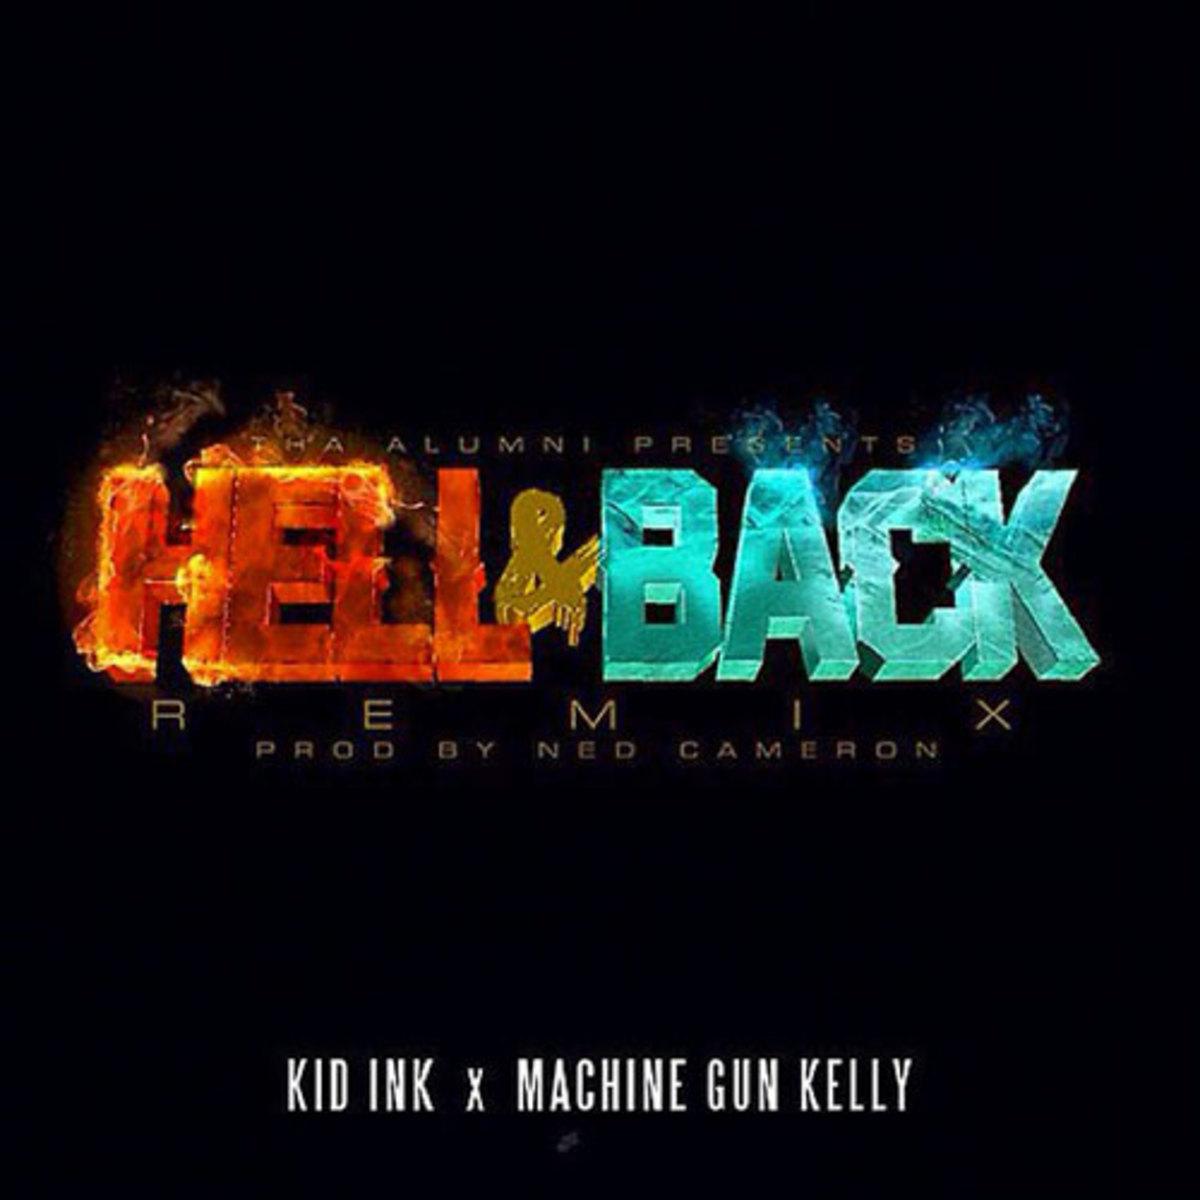 kidink-hellbackrmx.jpg